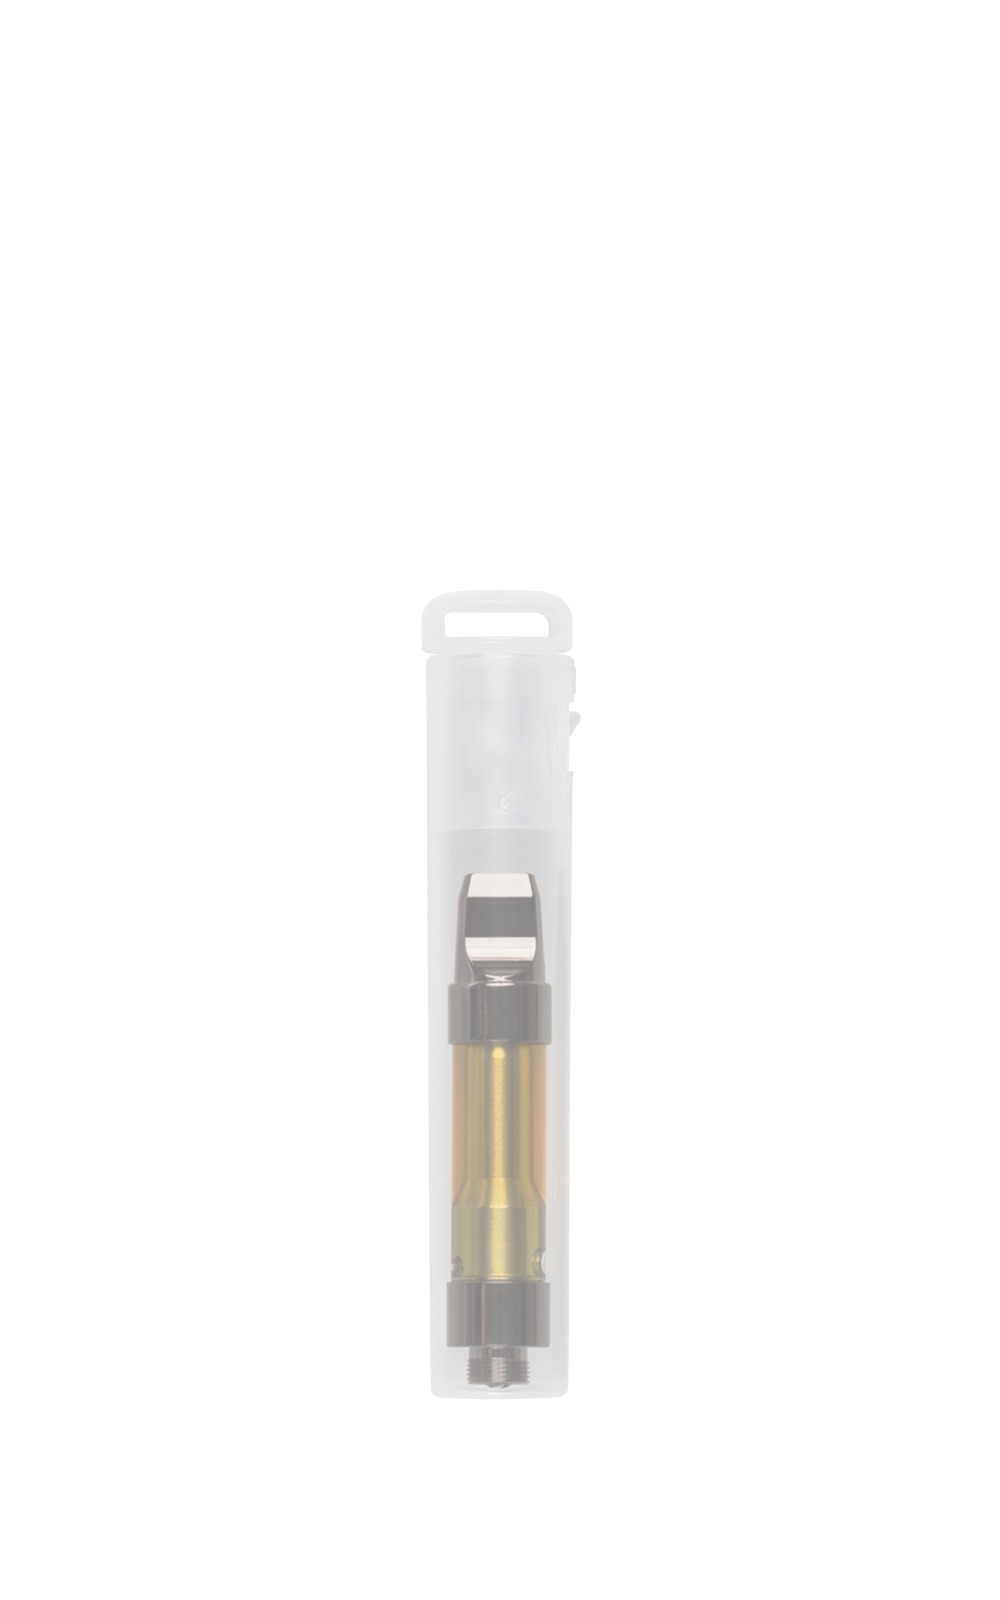 crpak-tube-87-Side-Cartridge.png